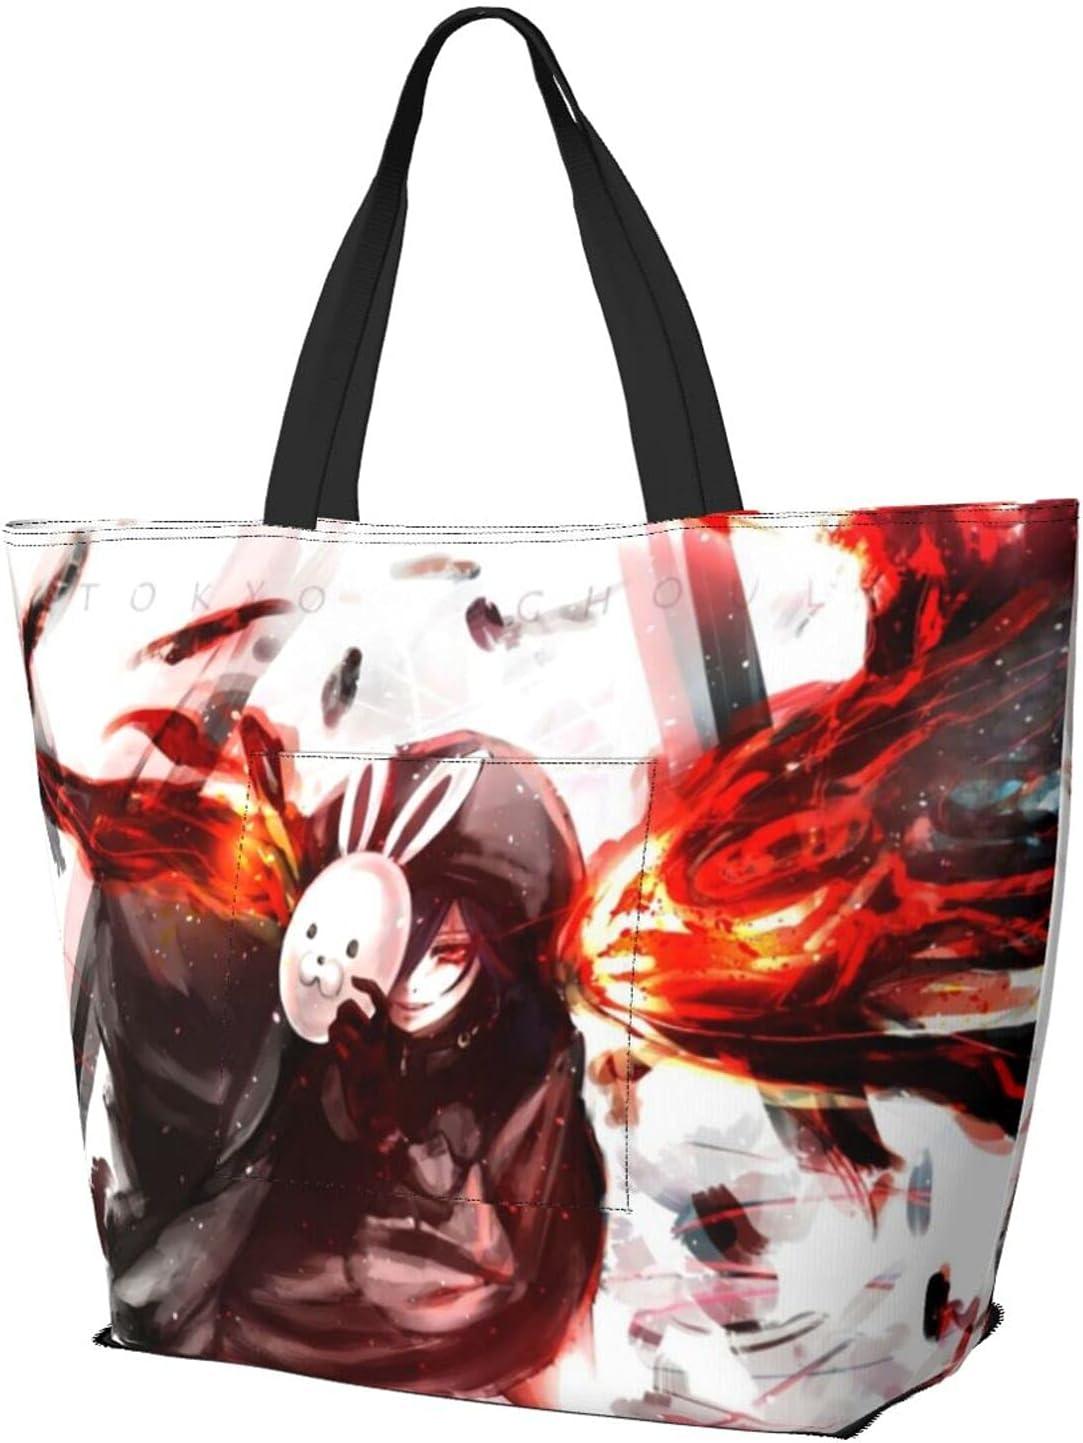 Overseas OFFicial mail order parallel import regular item Tokyo Ghoul Shoulder Bag Anime Touka Kirishima Durable